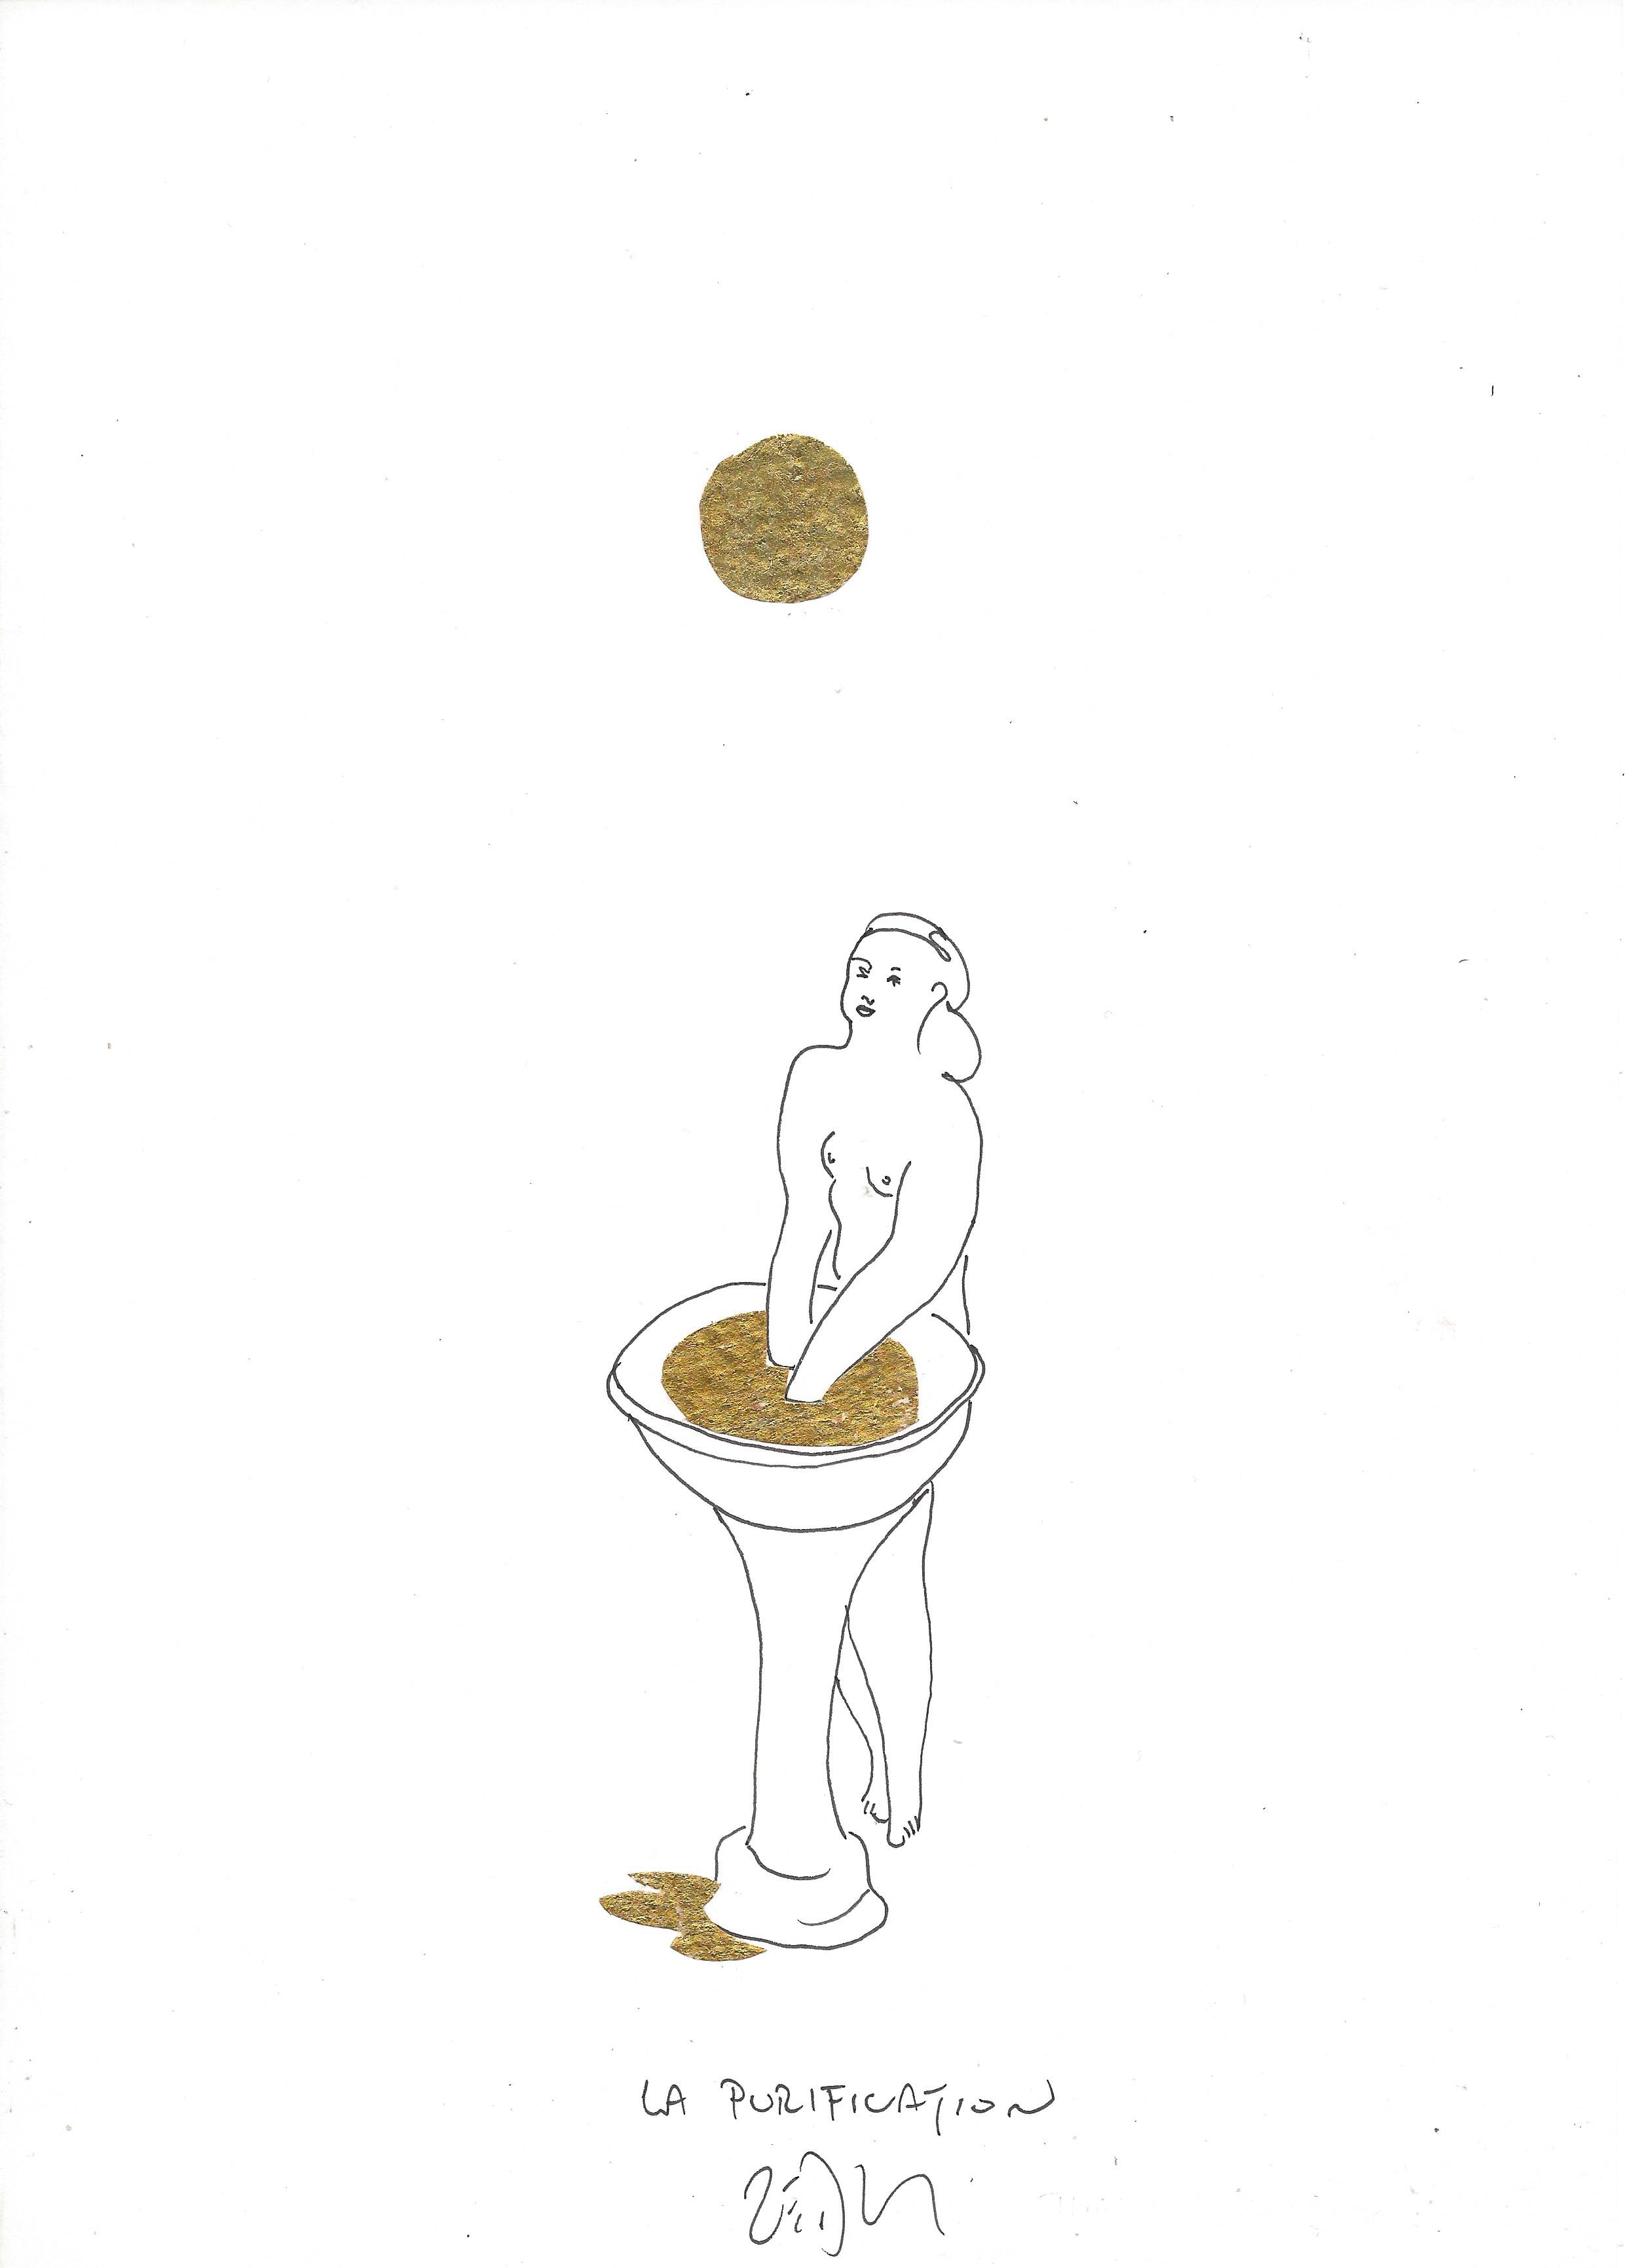 « The purification – La purification »